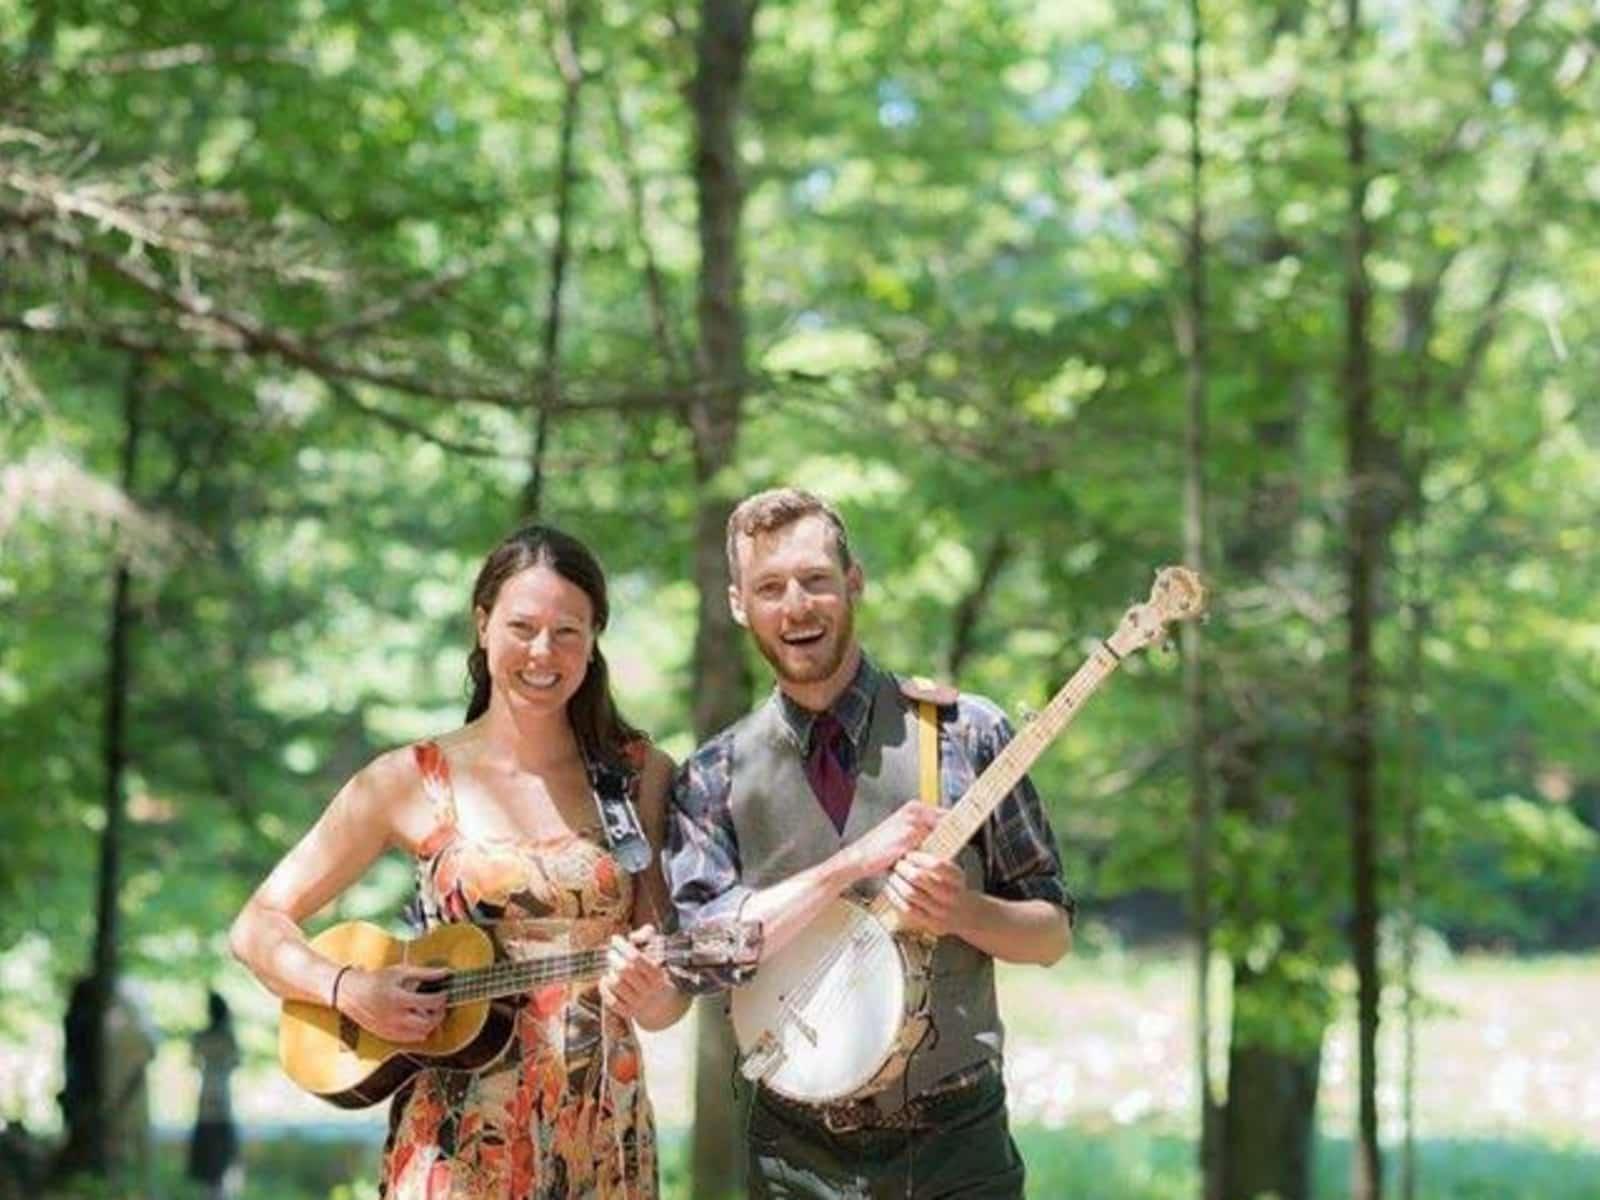 Lauren & Thomas from Chesterville, Ontario, Canada